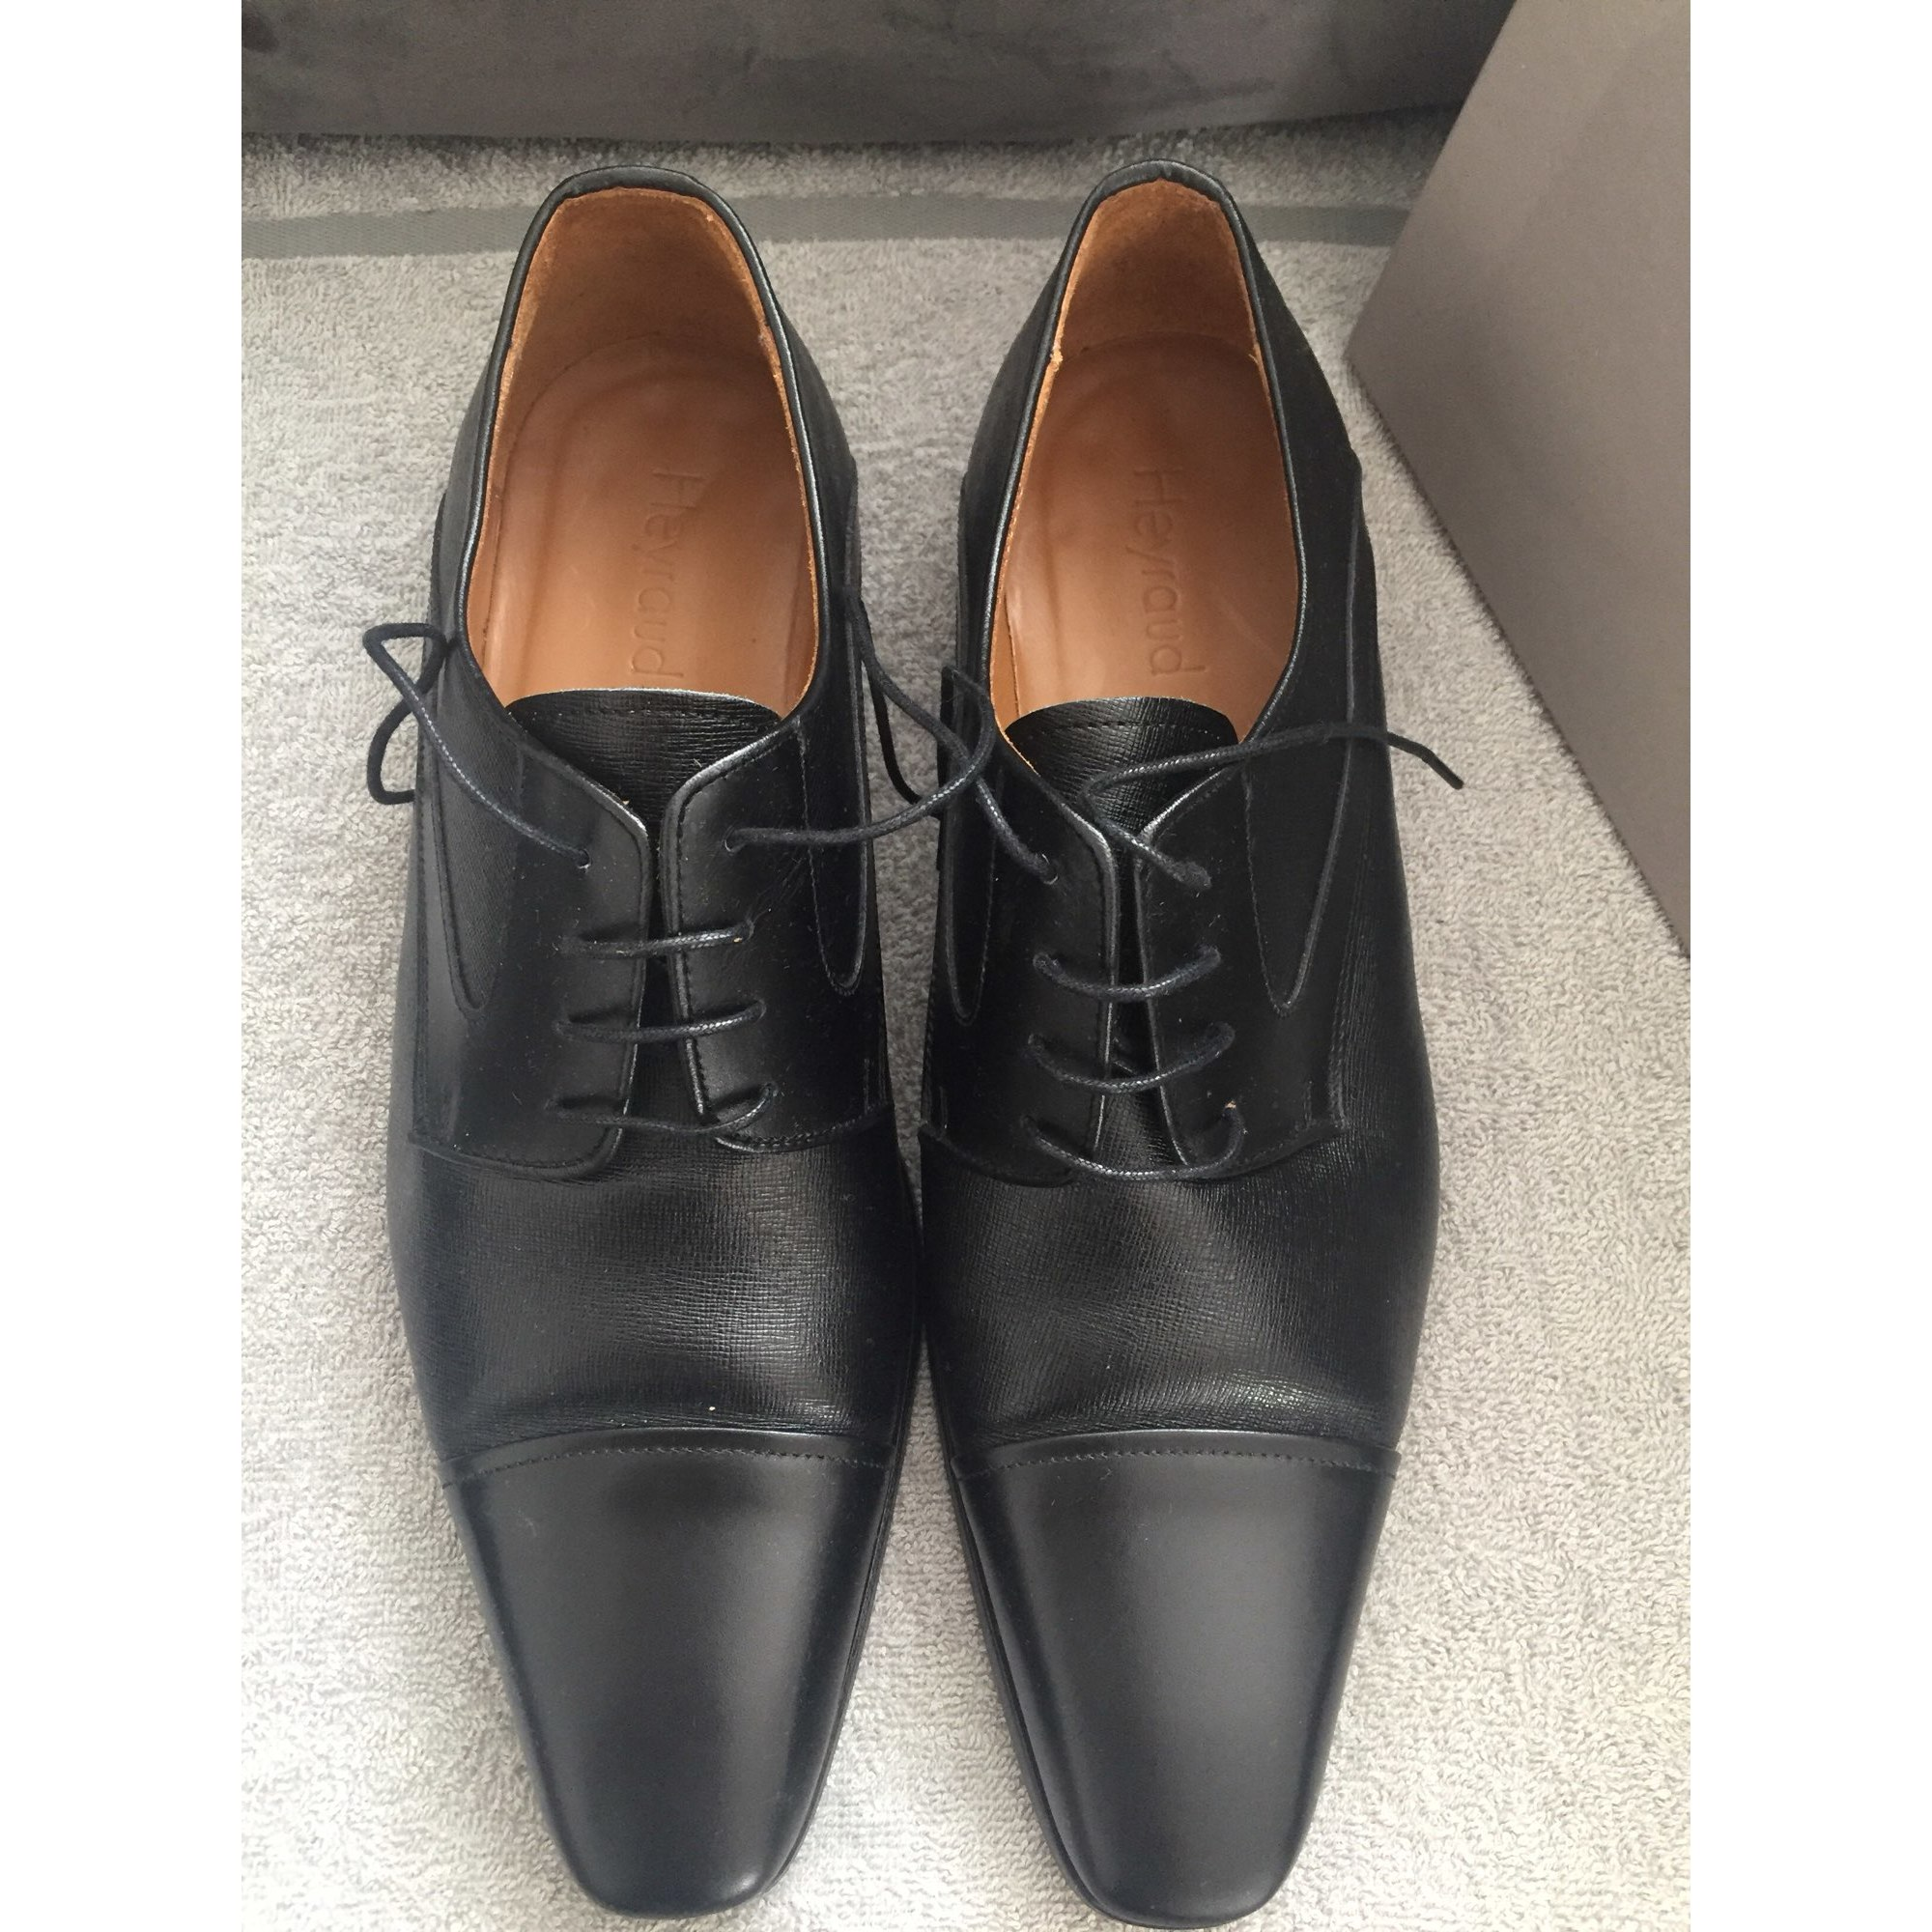 dff8e505a1eaa9 Chaussures à lacets HEYRAUD 44 noir - 7885739